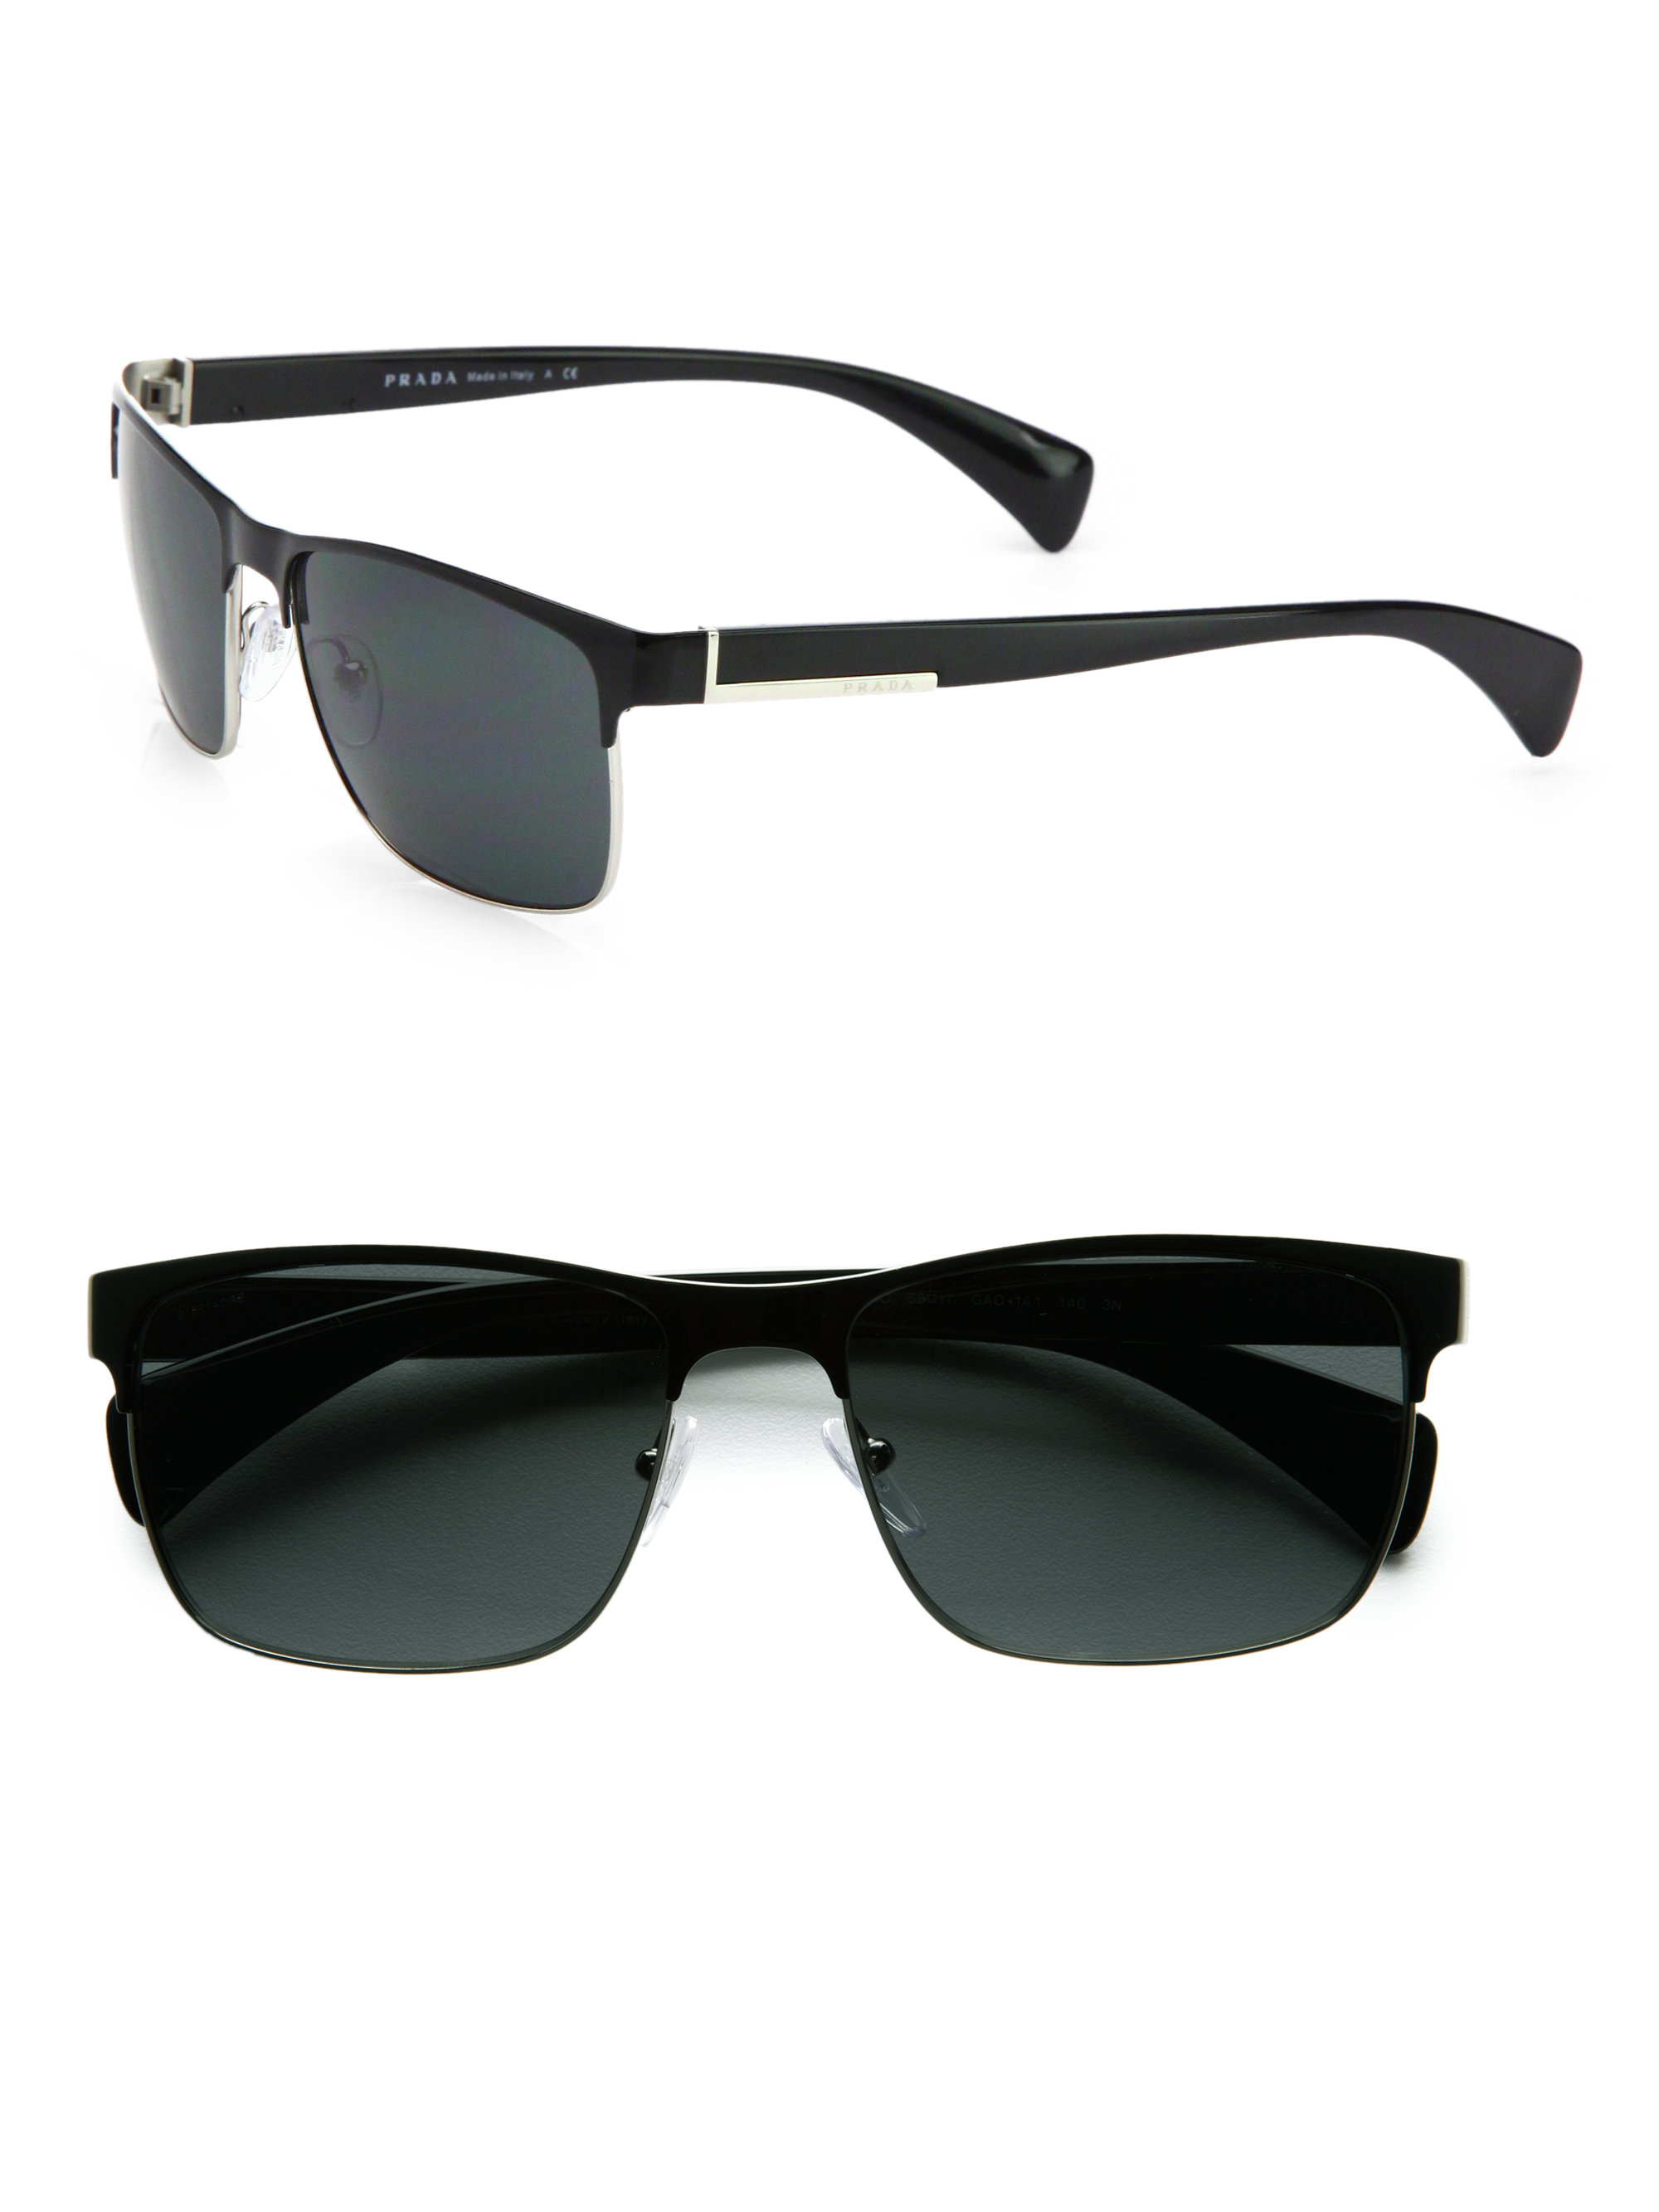 38011ec41c01b germany prada eyewear two tone rounded frame glasses pink purple 44ec3  b8845  store prada twotone square sunglasses in black for men lyst 1b608  61c47